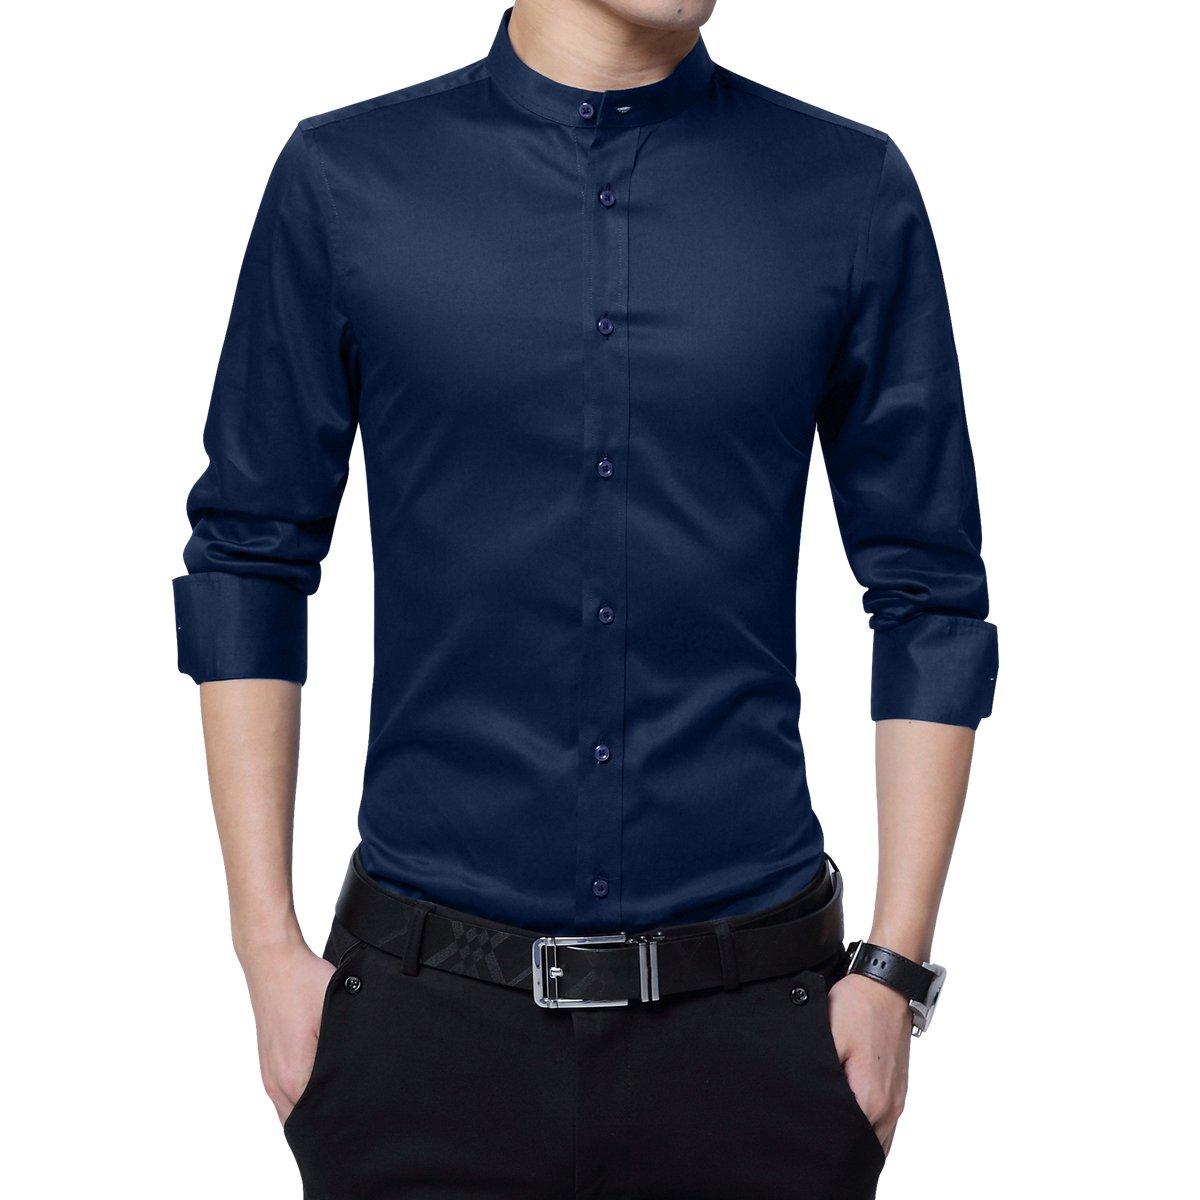 Boyland Mens Dress Shirt Long Sleeve Baned Collar Slim Fit Formal Shirt Business Office Wedding Work